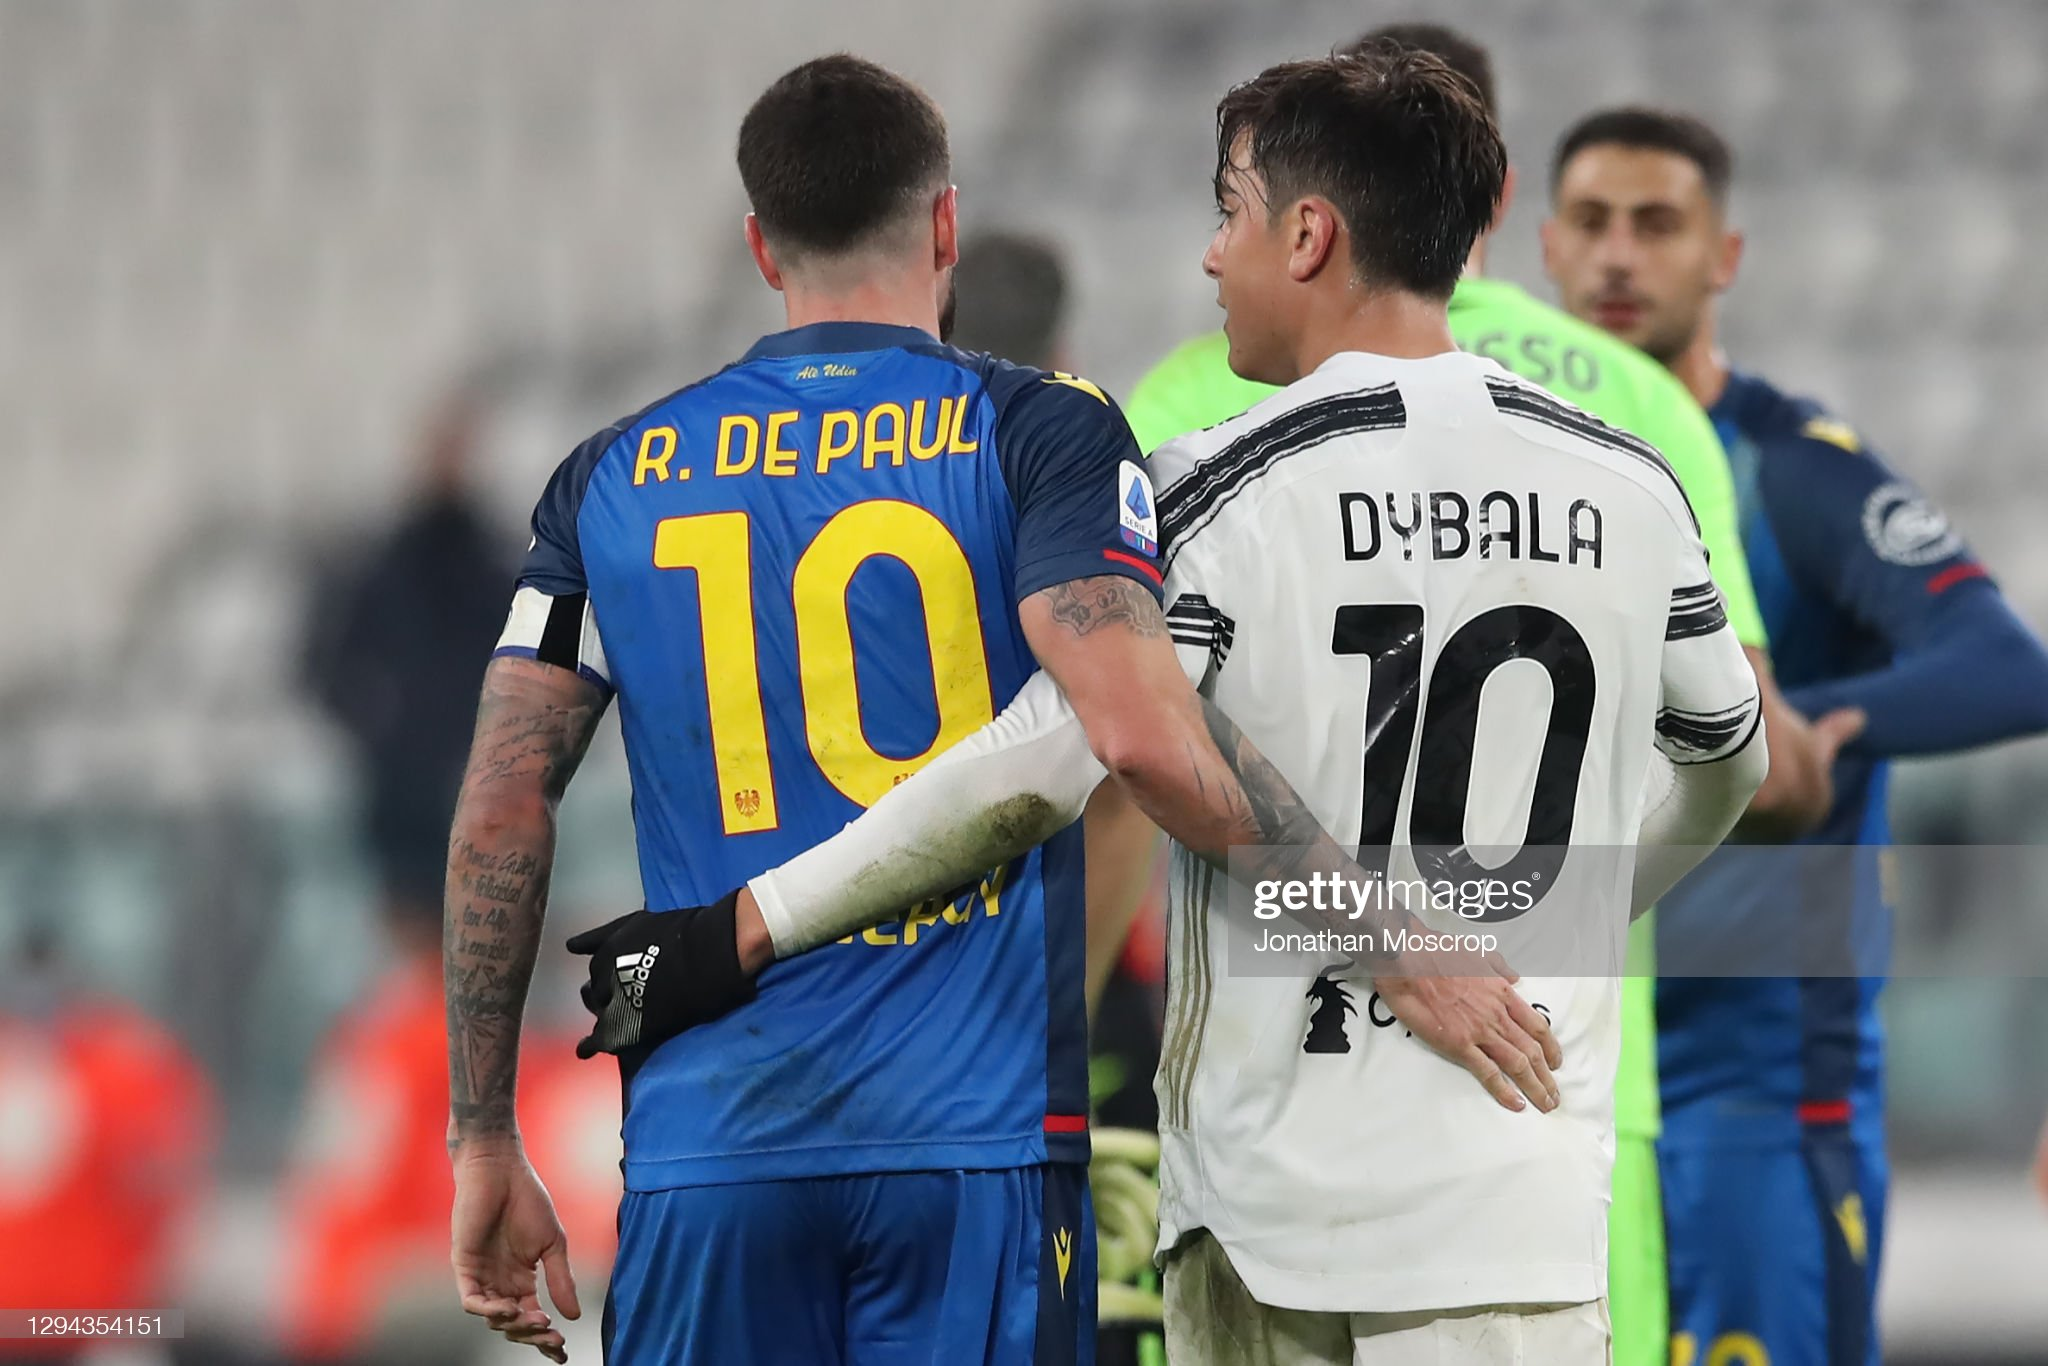 ¿Cuanto mide Rodrigo De Paul? Paulo-dybala-of-juventus-is-embraced-by-rodrigo-de-paul-of-udinese-picture-id1294354151?s=2048x2048